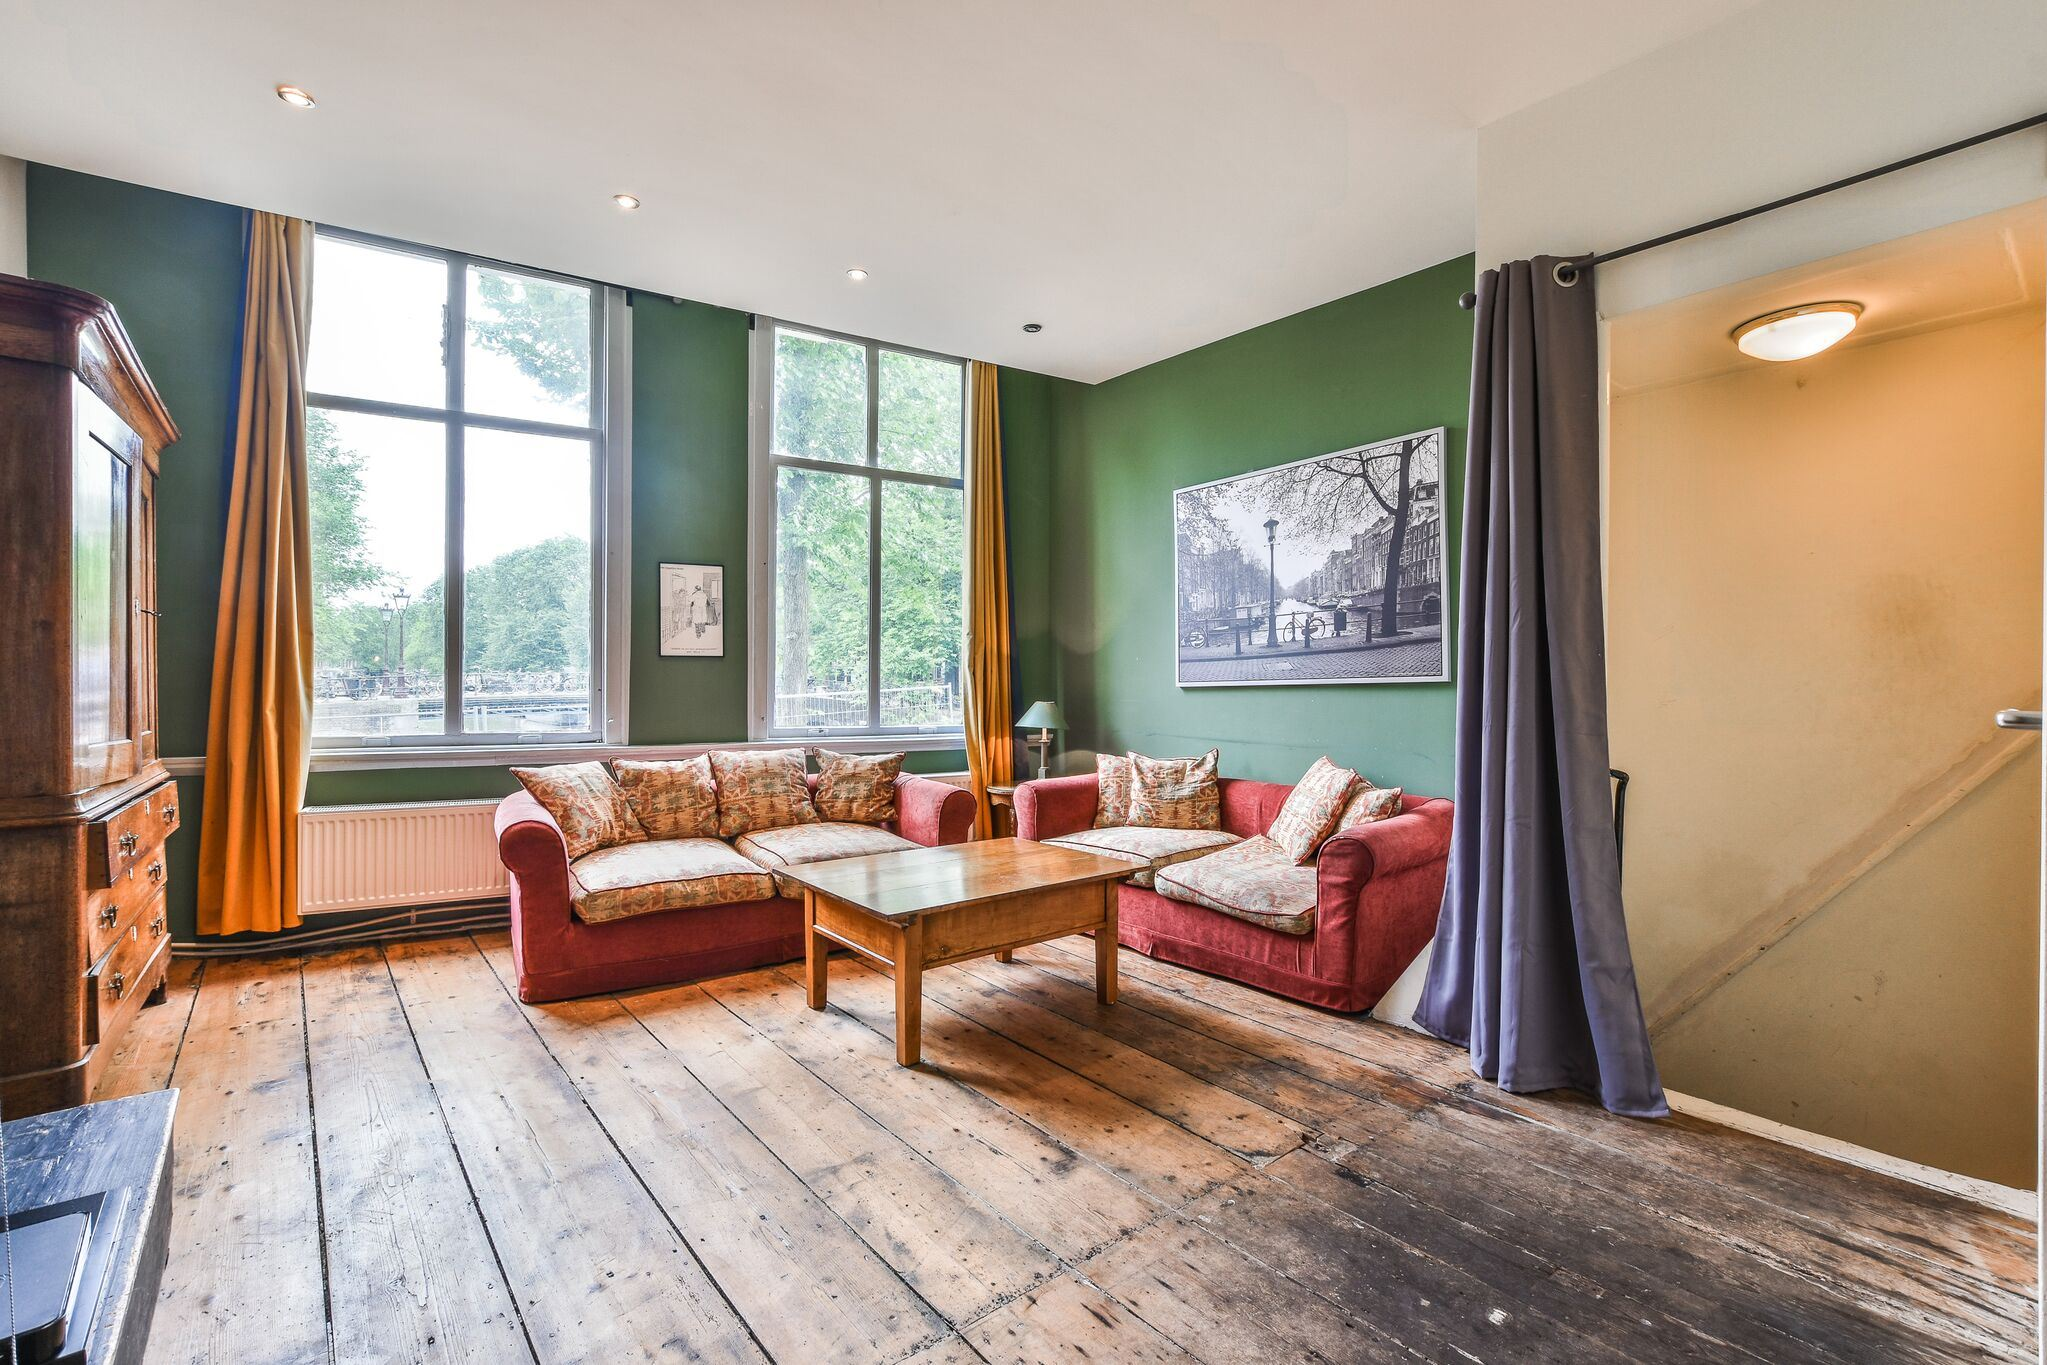 Apartment for sale herengracht huis ba amsterdam funda